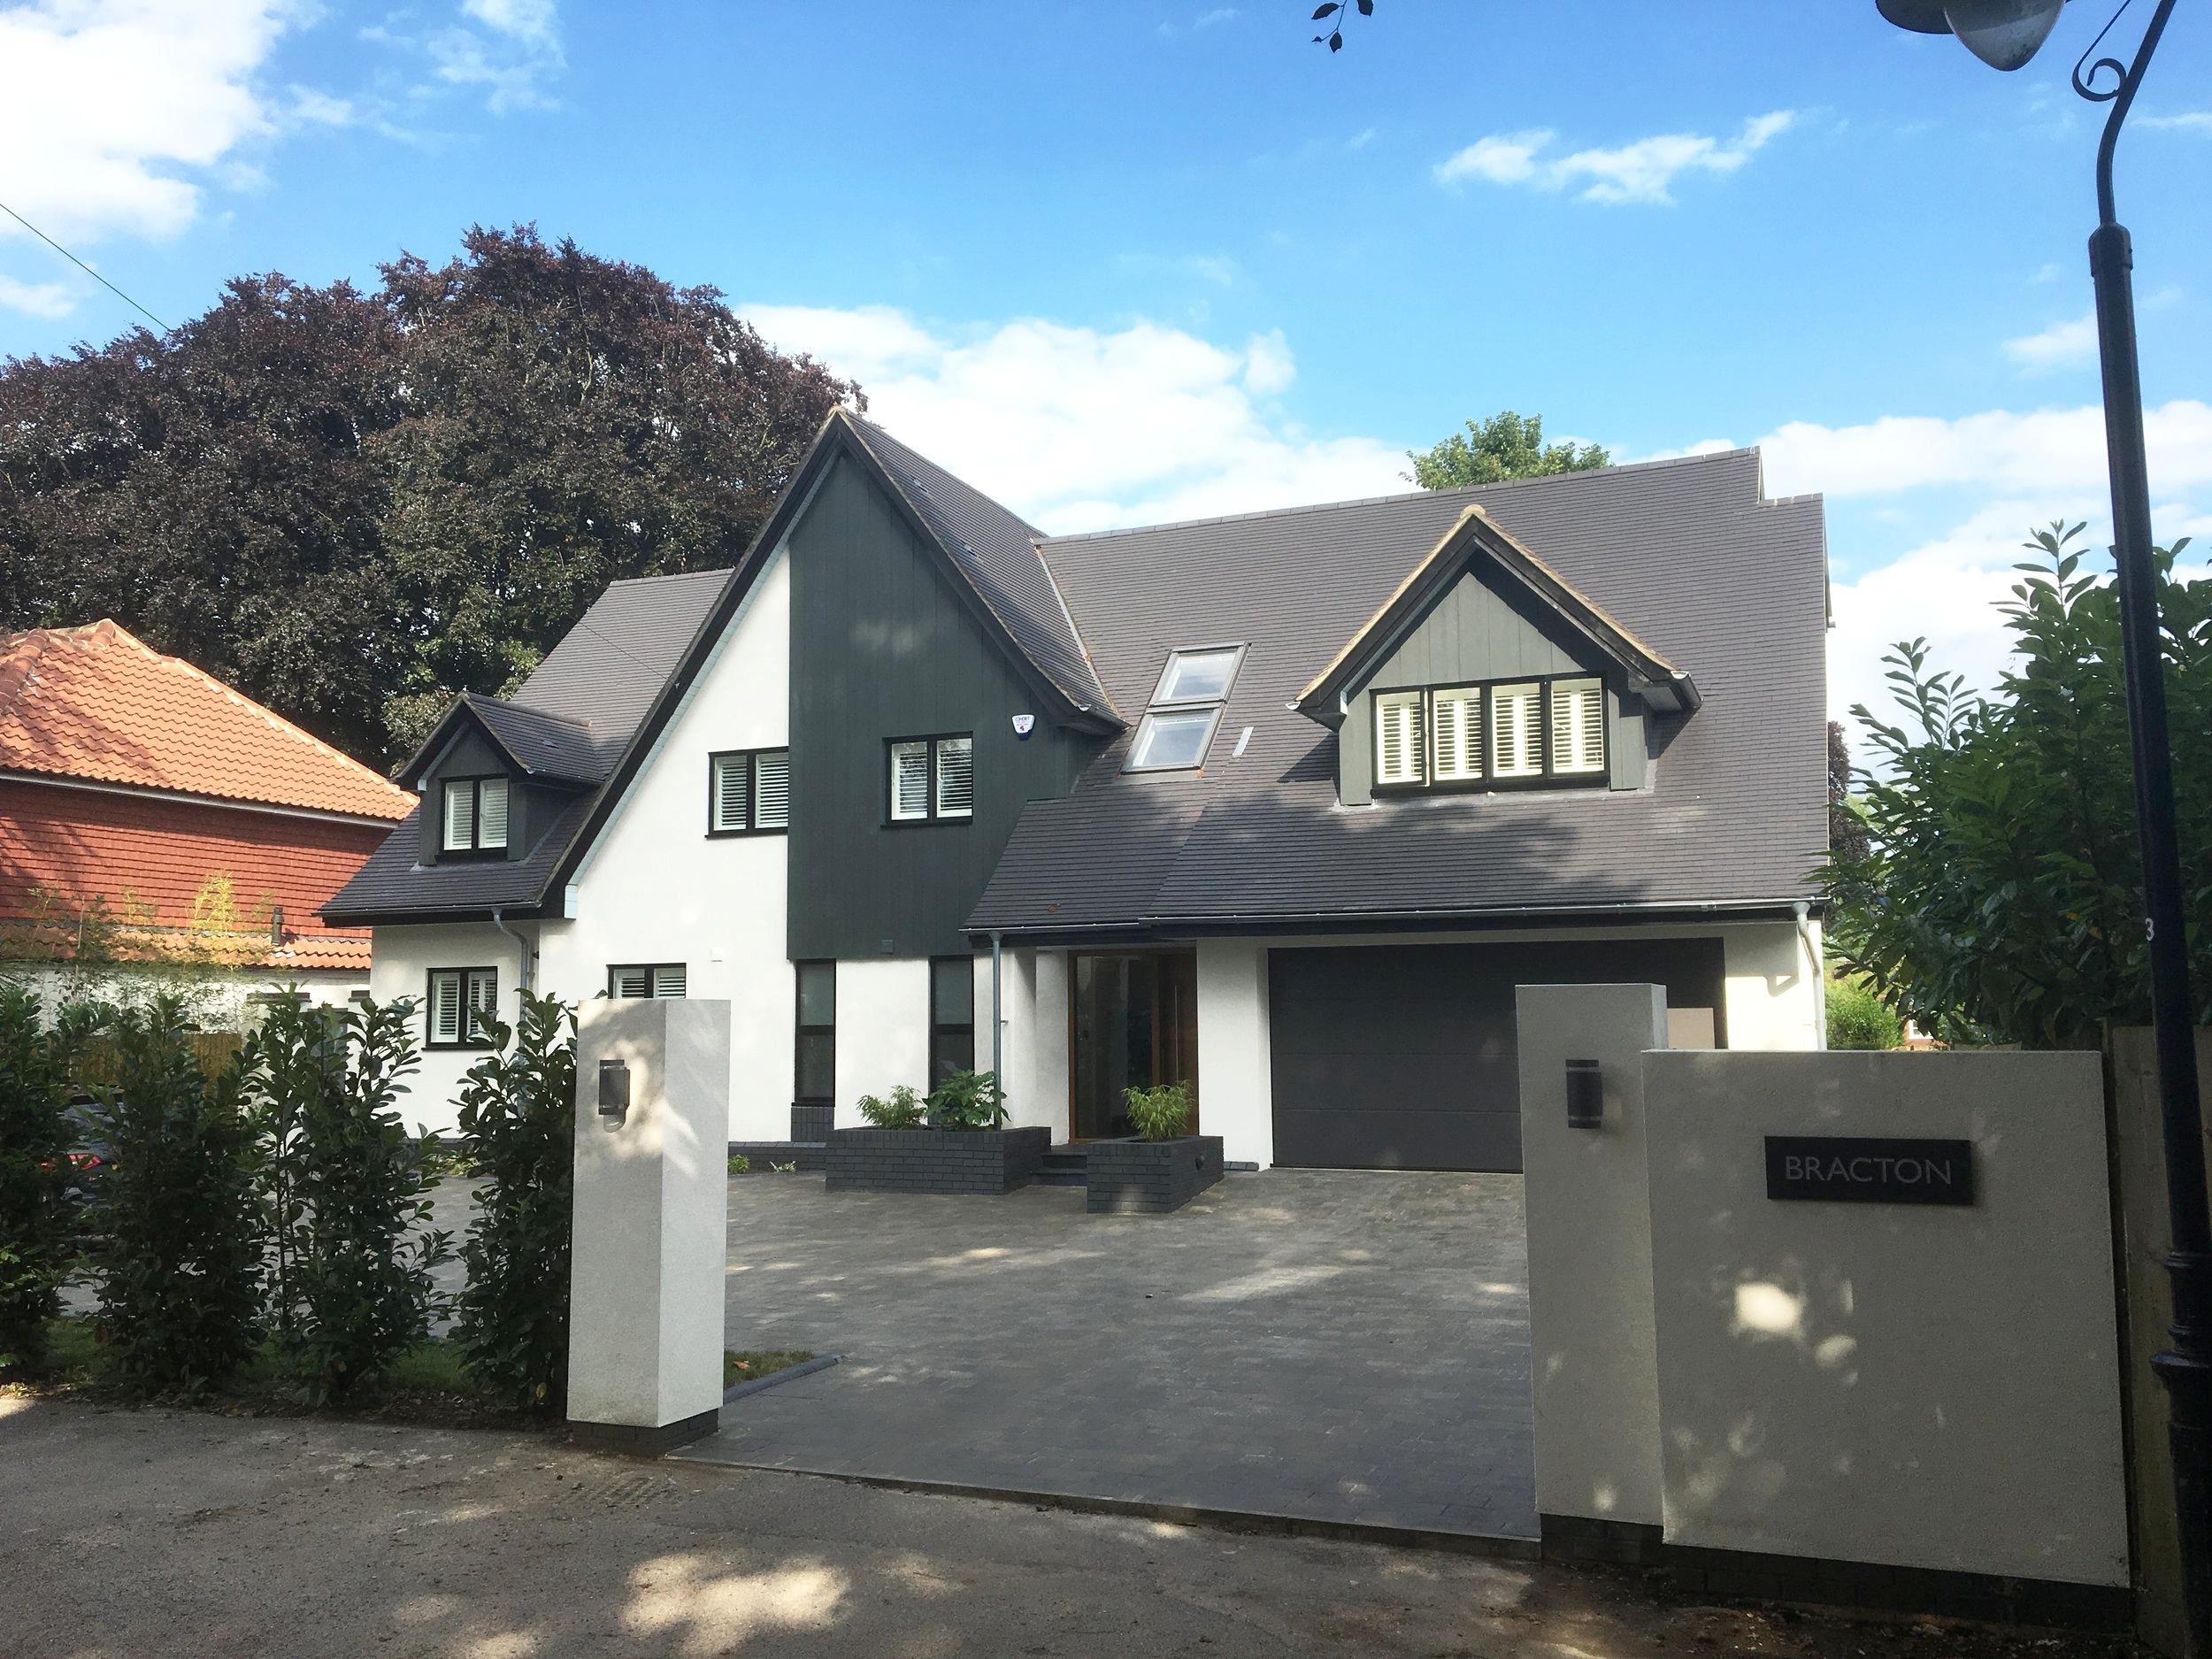 Bracton Cottage, Bray